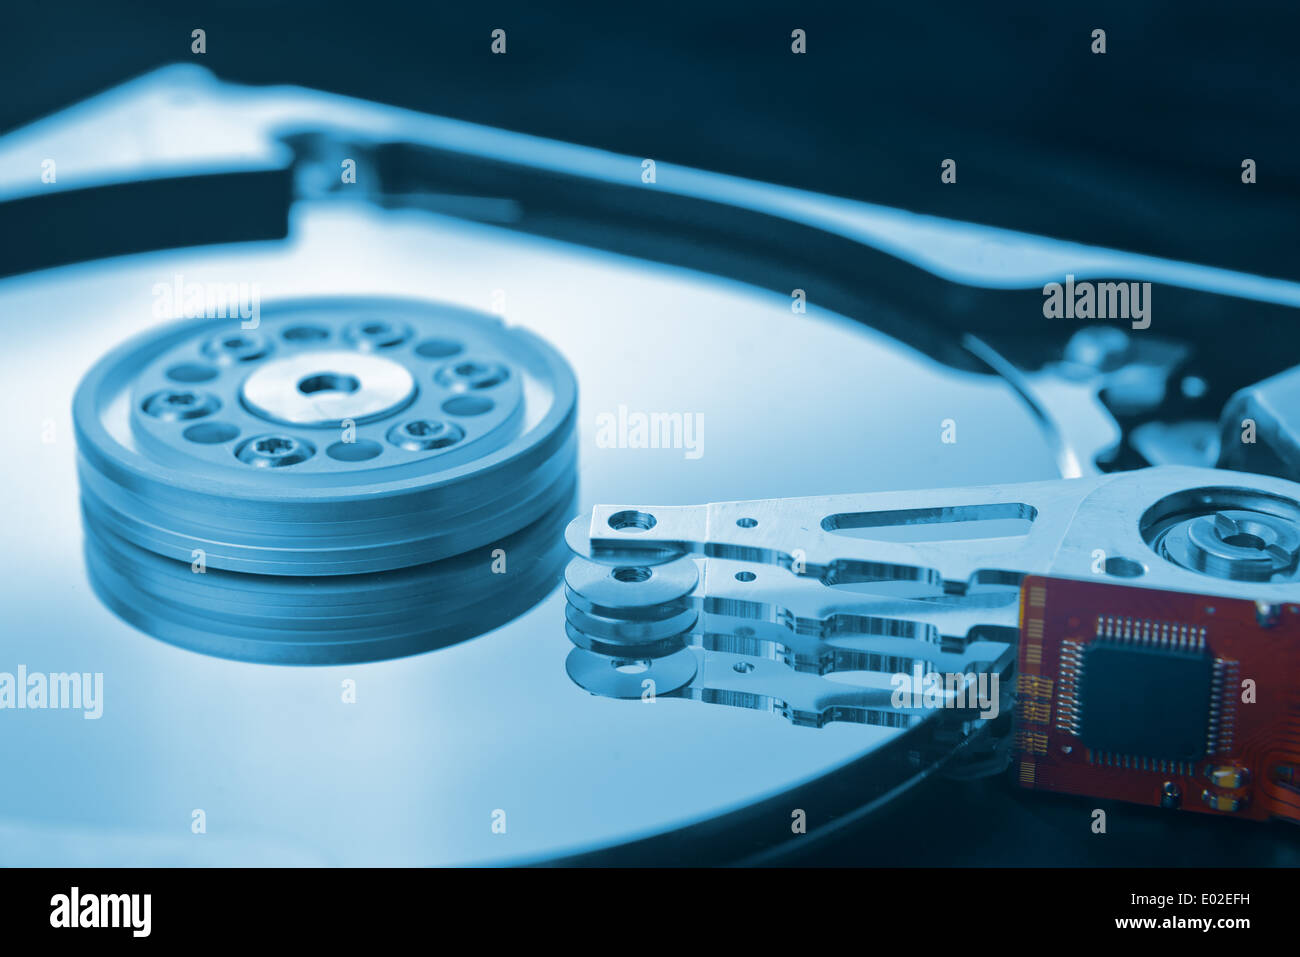 Computer hard disk close up - Stock Image